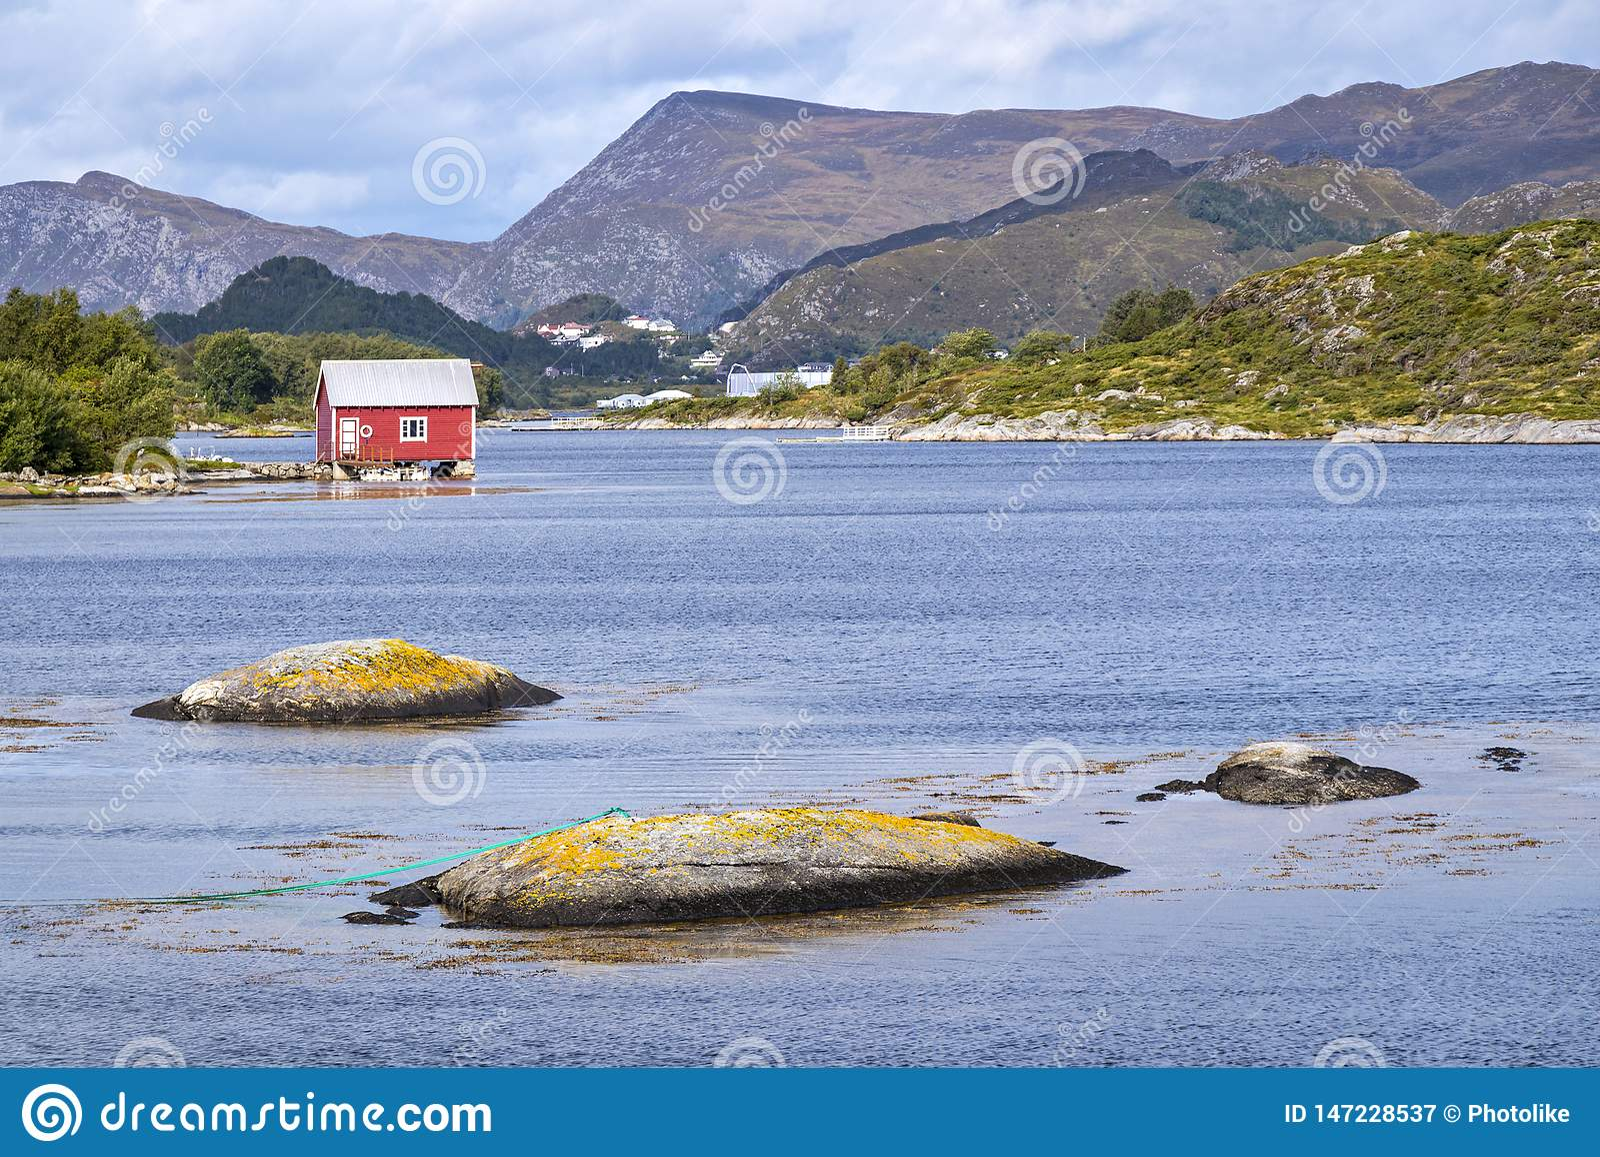 Cabinas viejas, varaderos, isla Nautoya, Noruega